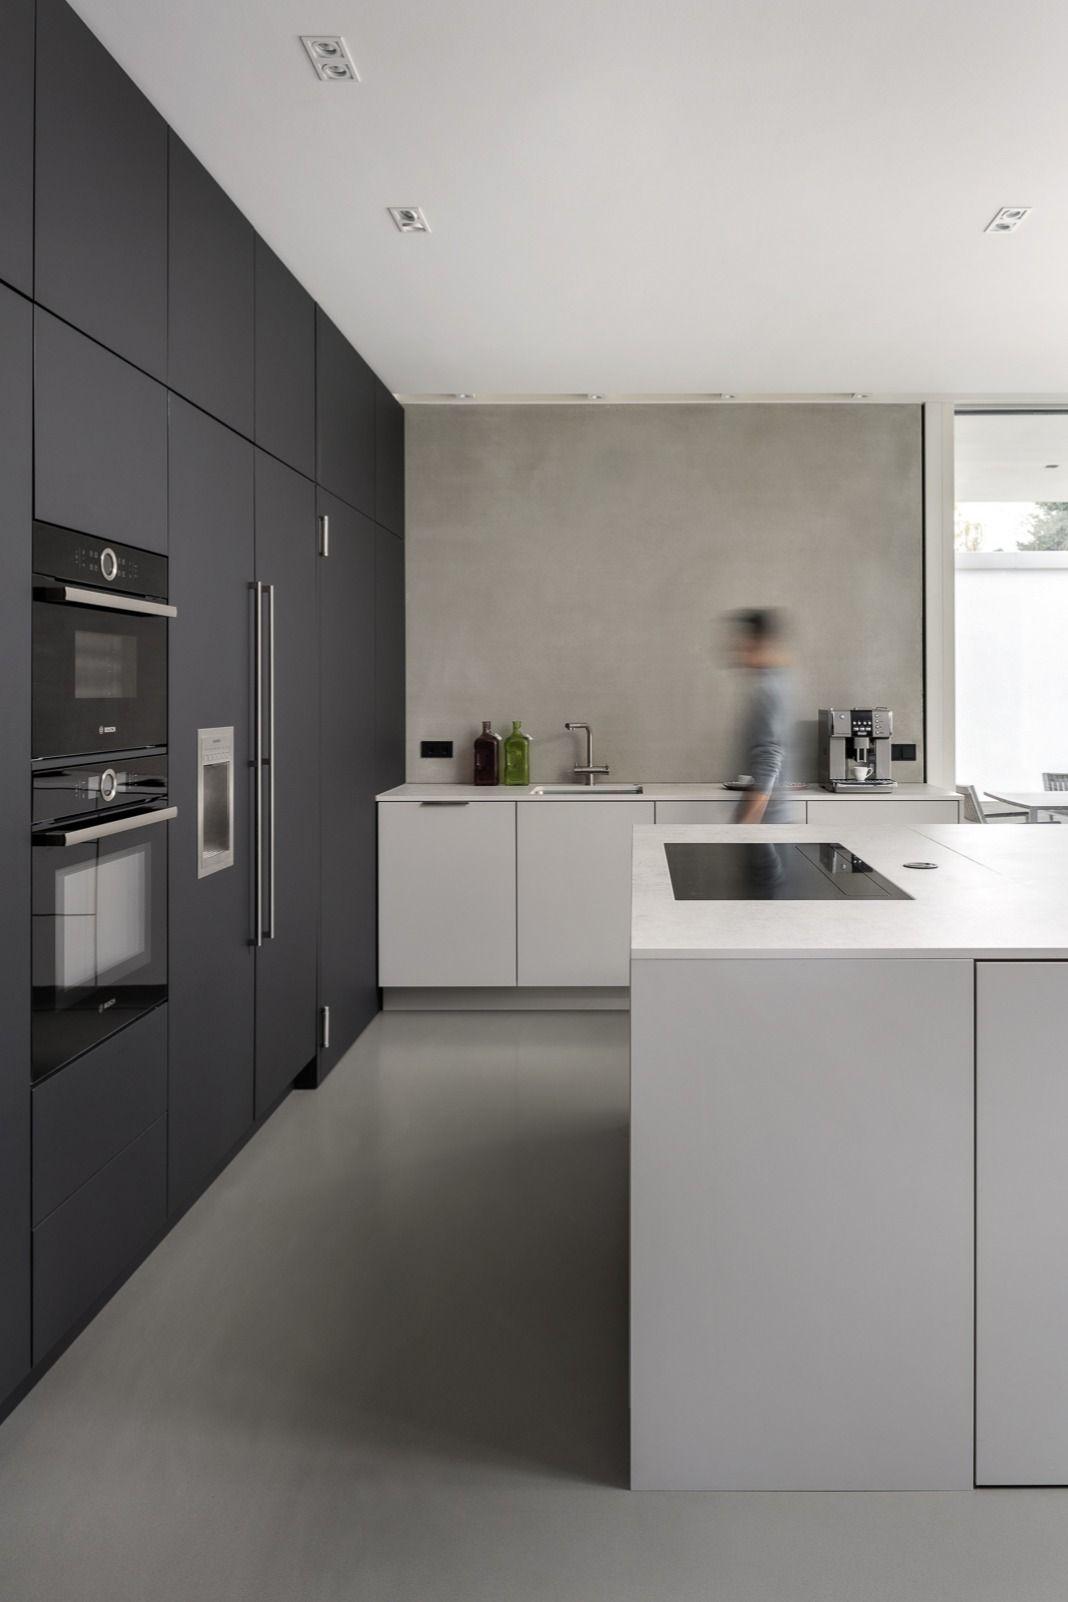 Resin Floor Kitchen In 2020 Kitchen Room Design Kitchen Flooring Kitchen Design